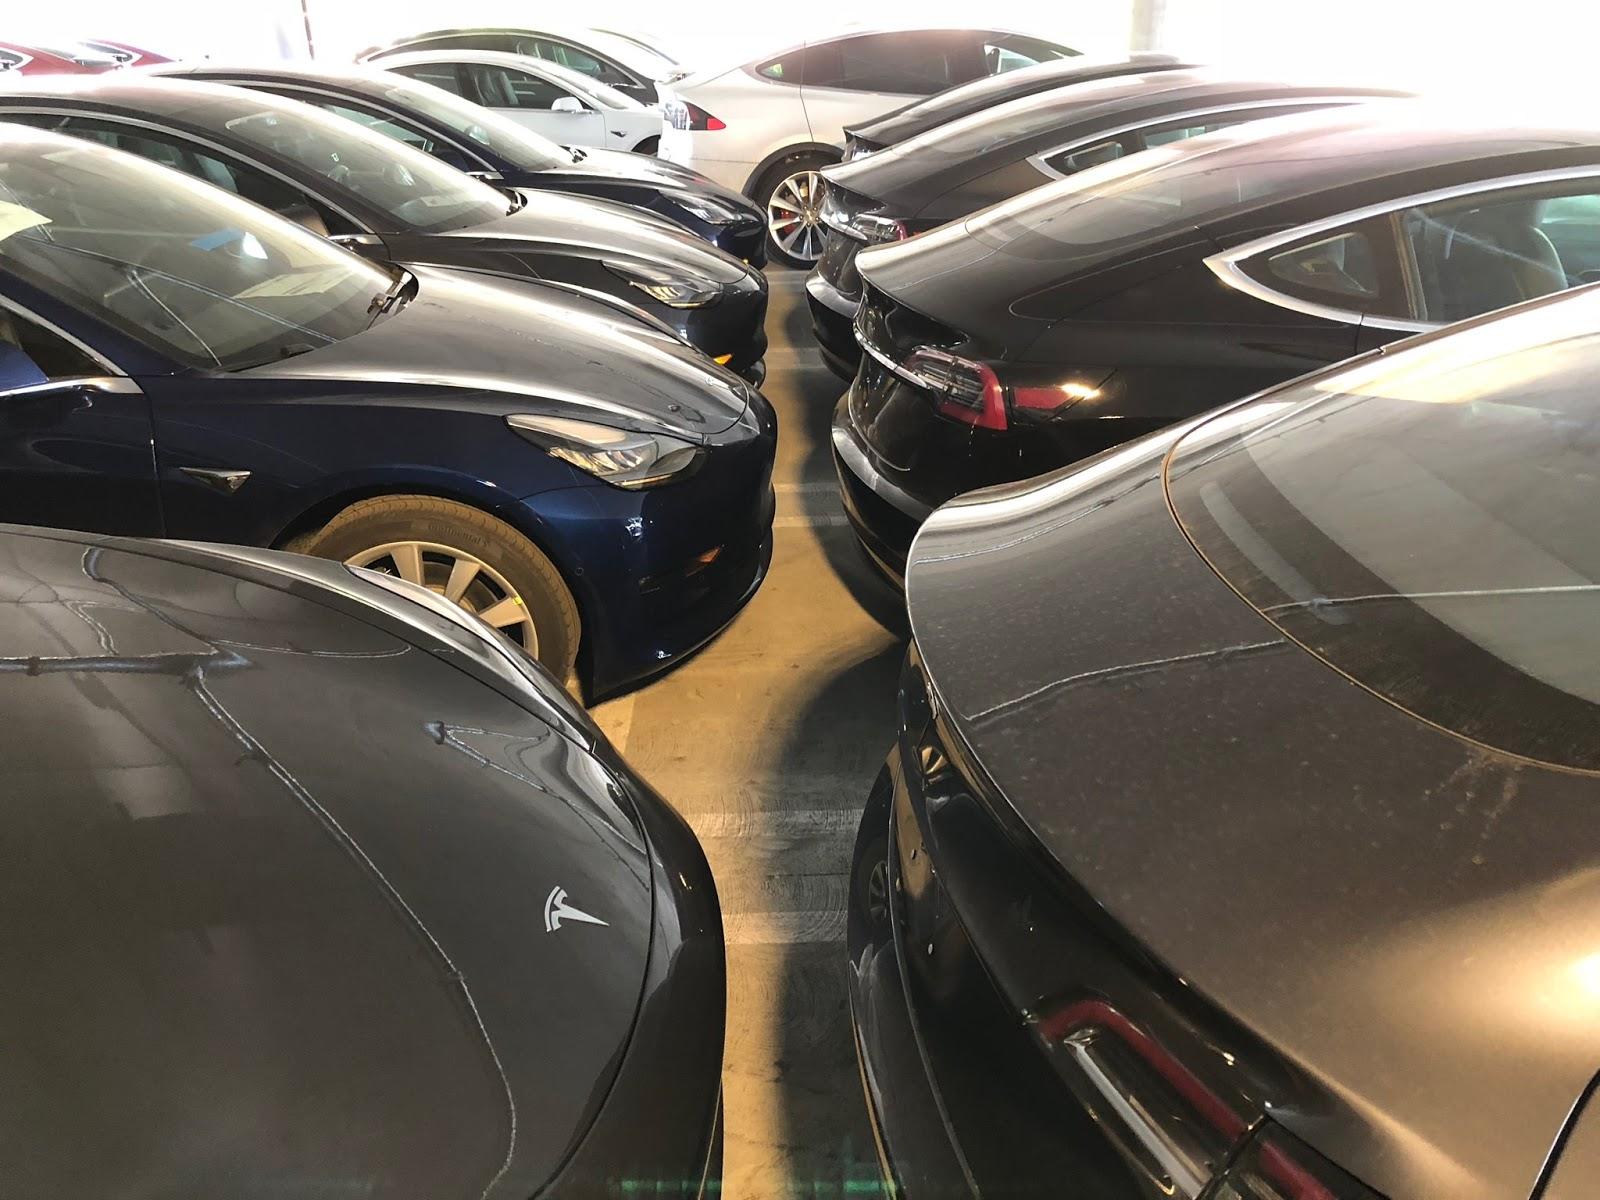 Tesla-LA-Parking-Lot-6